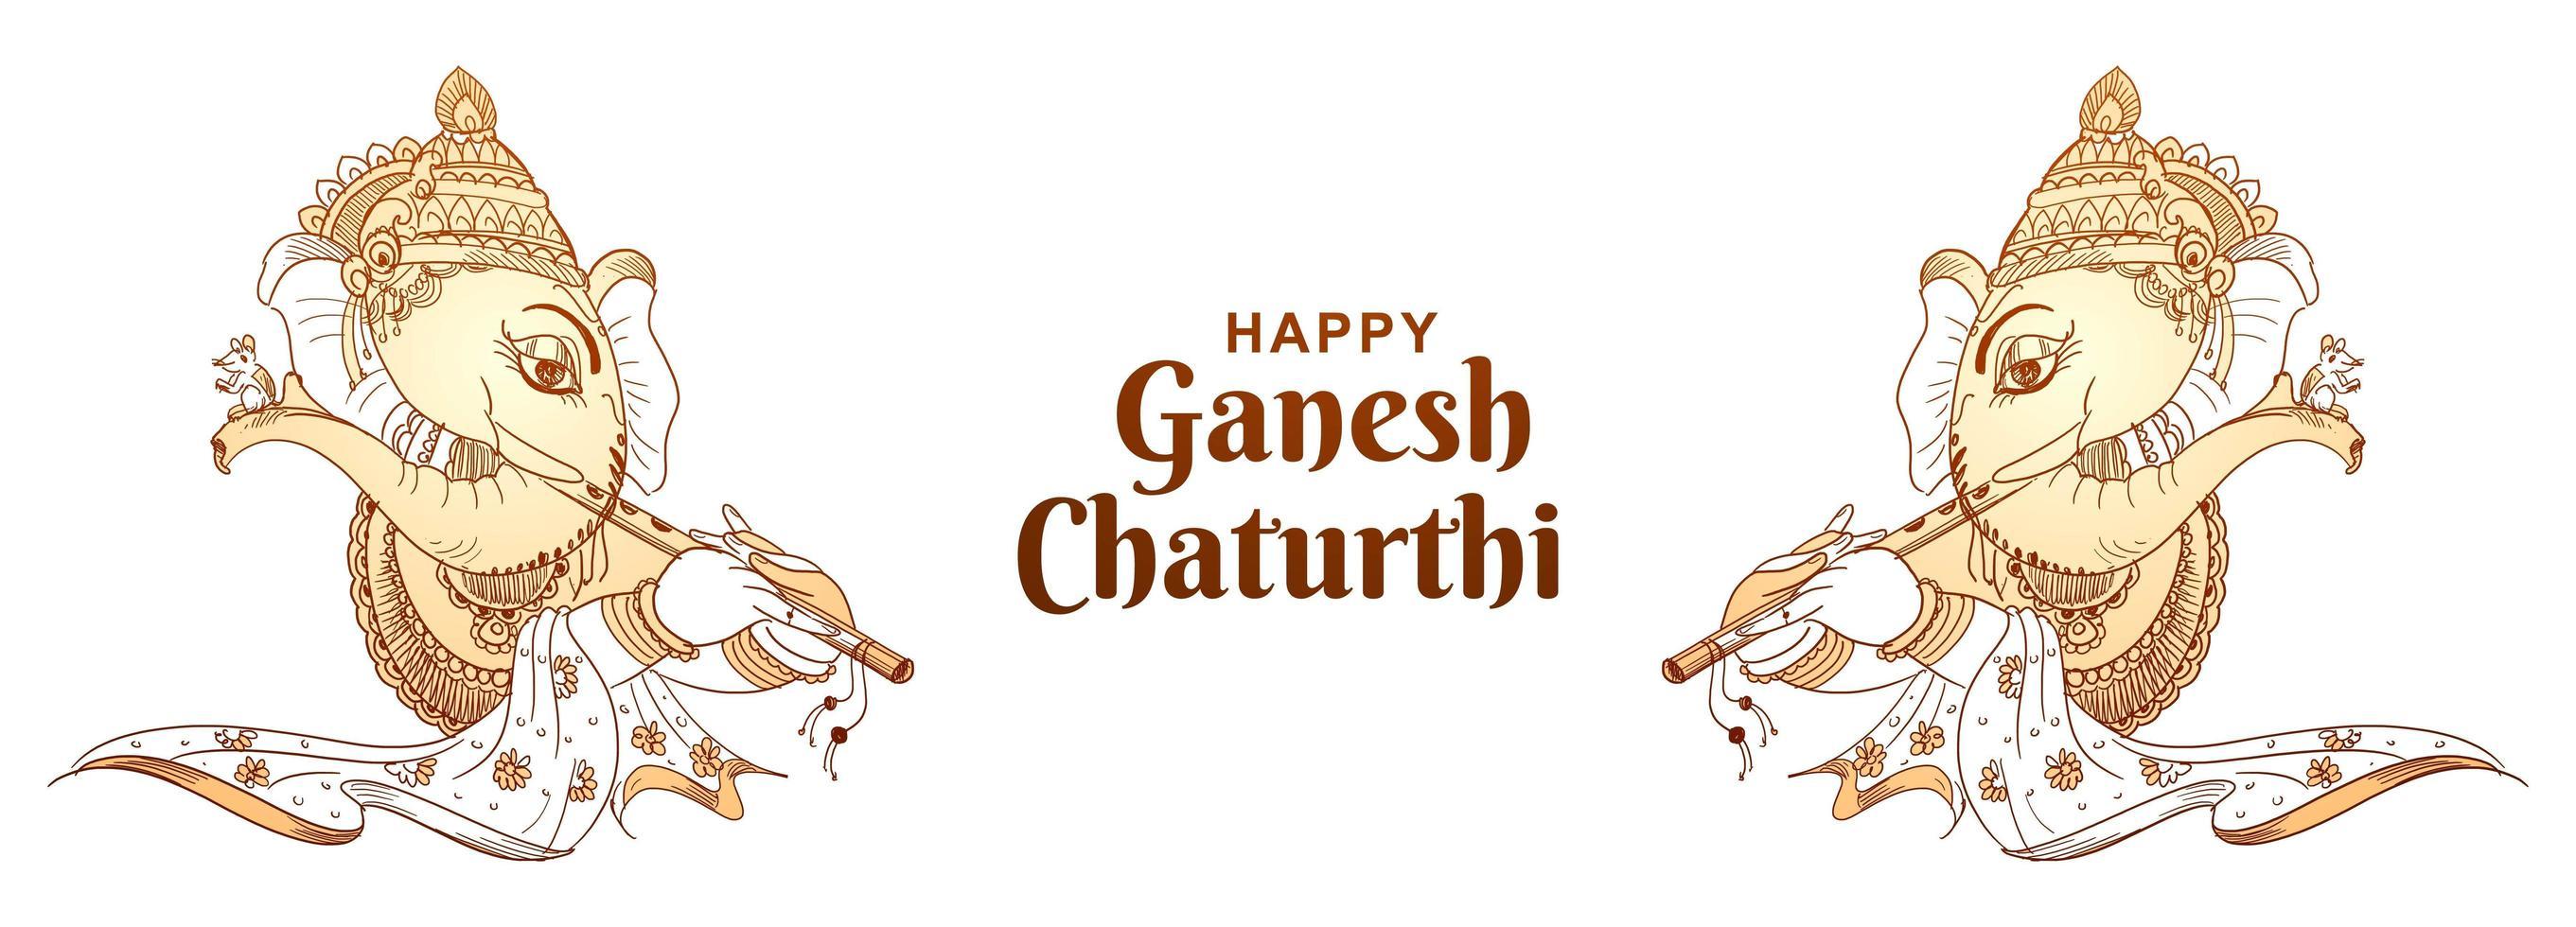 banner de festival indio de ganesh chaturthi de contorno monocrom vector